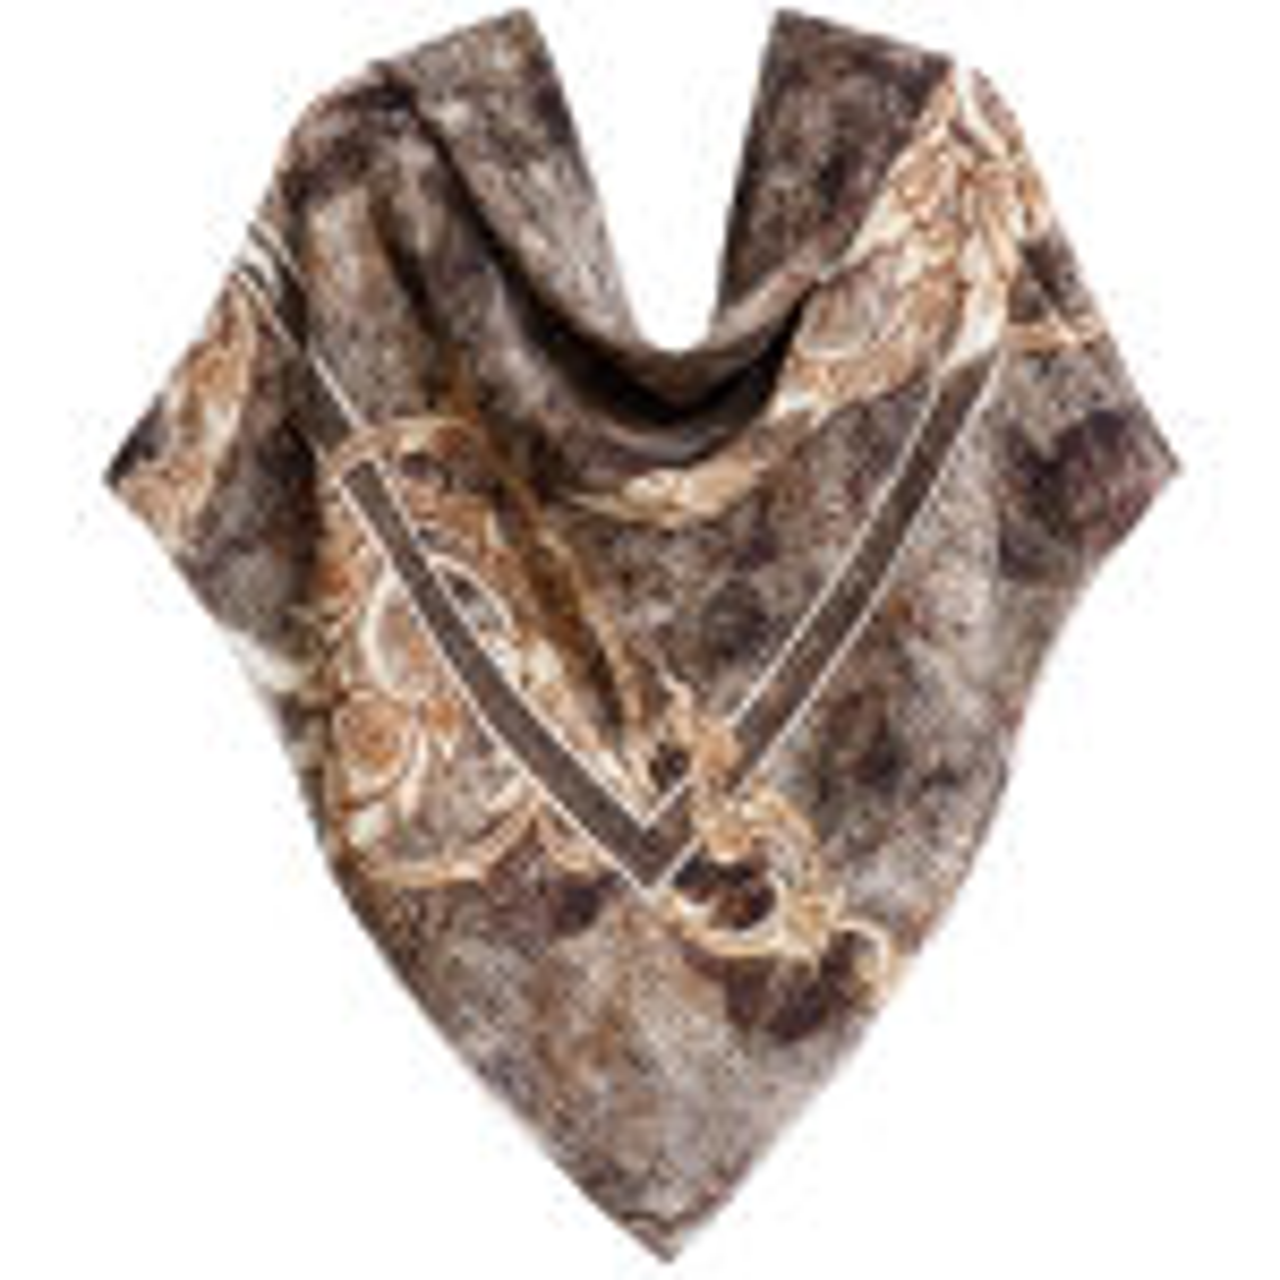 روسری زنانه کد Tp_44228-52